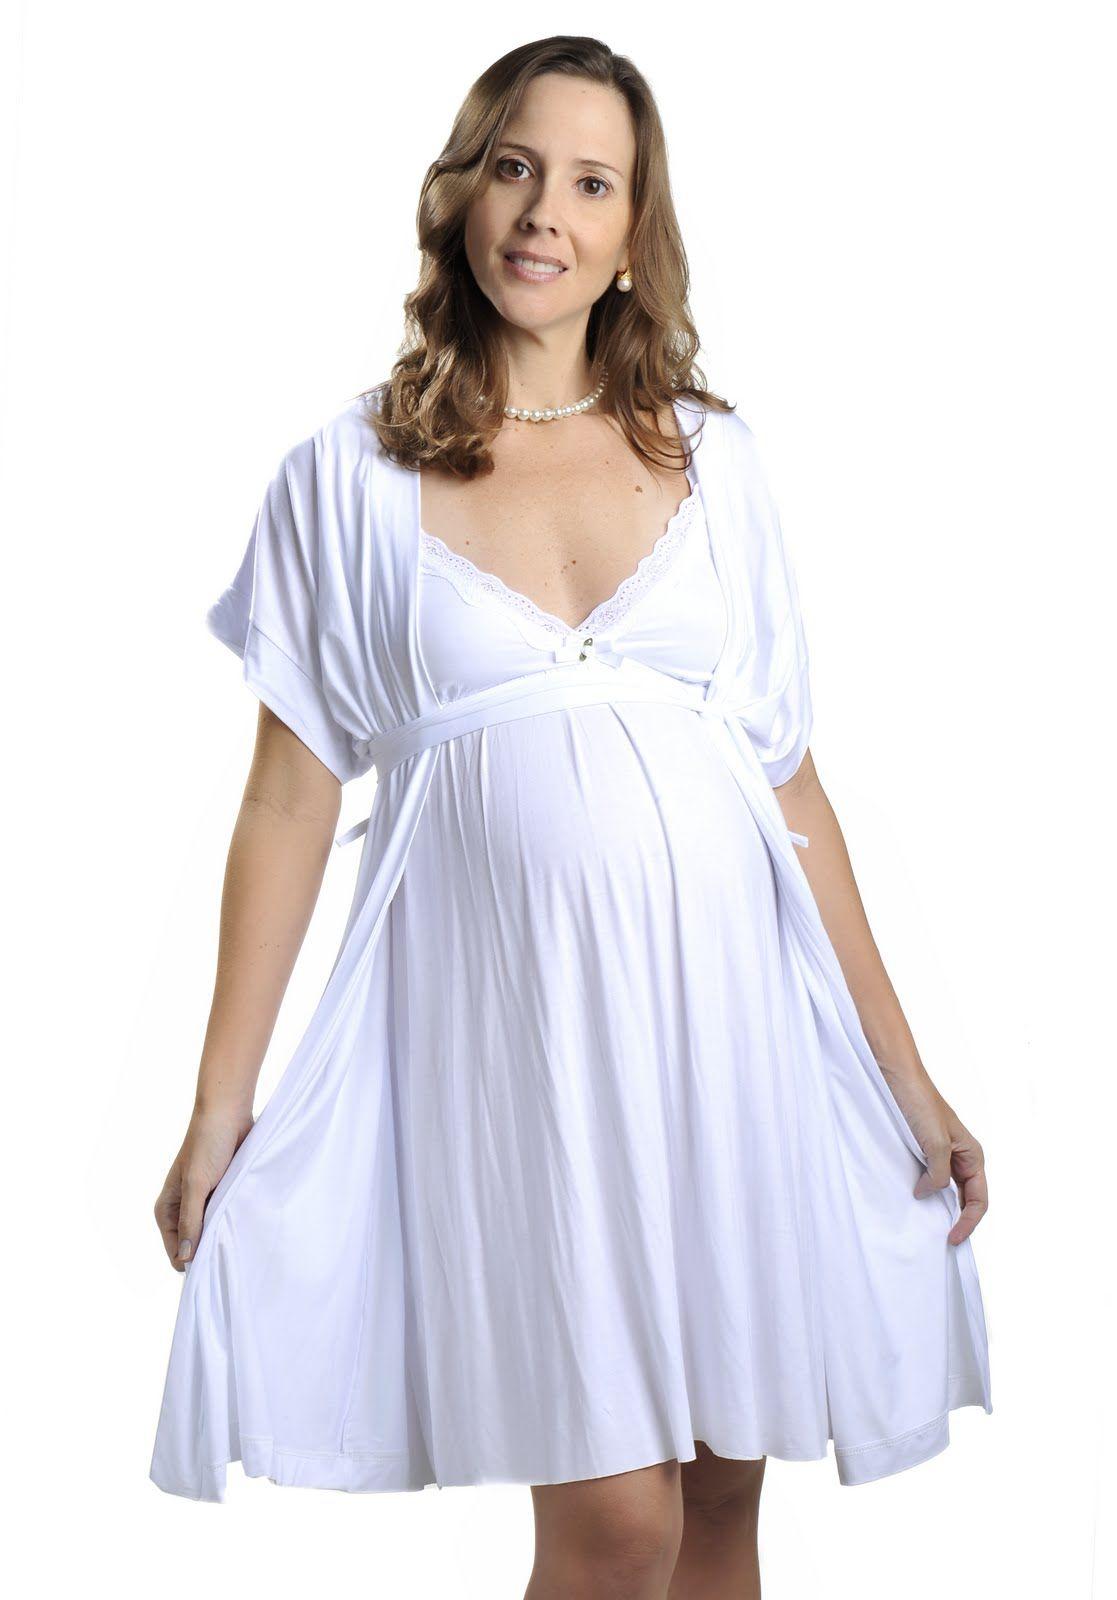 Como Escolher a Camisola para a Maternidade  956bede632324